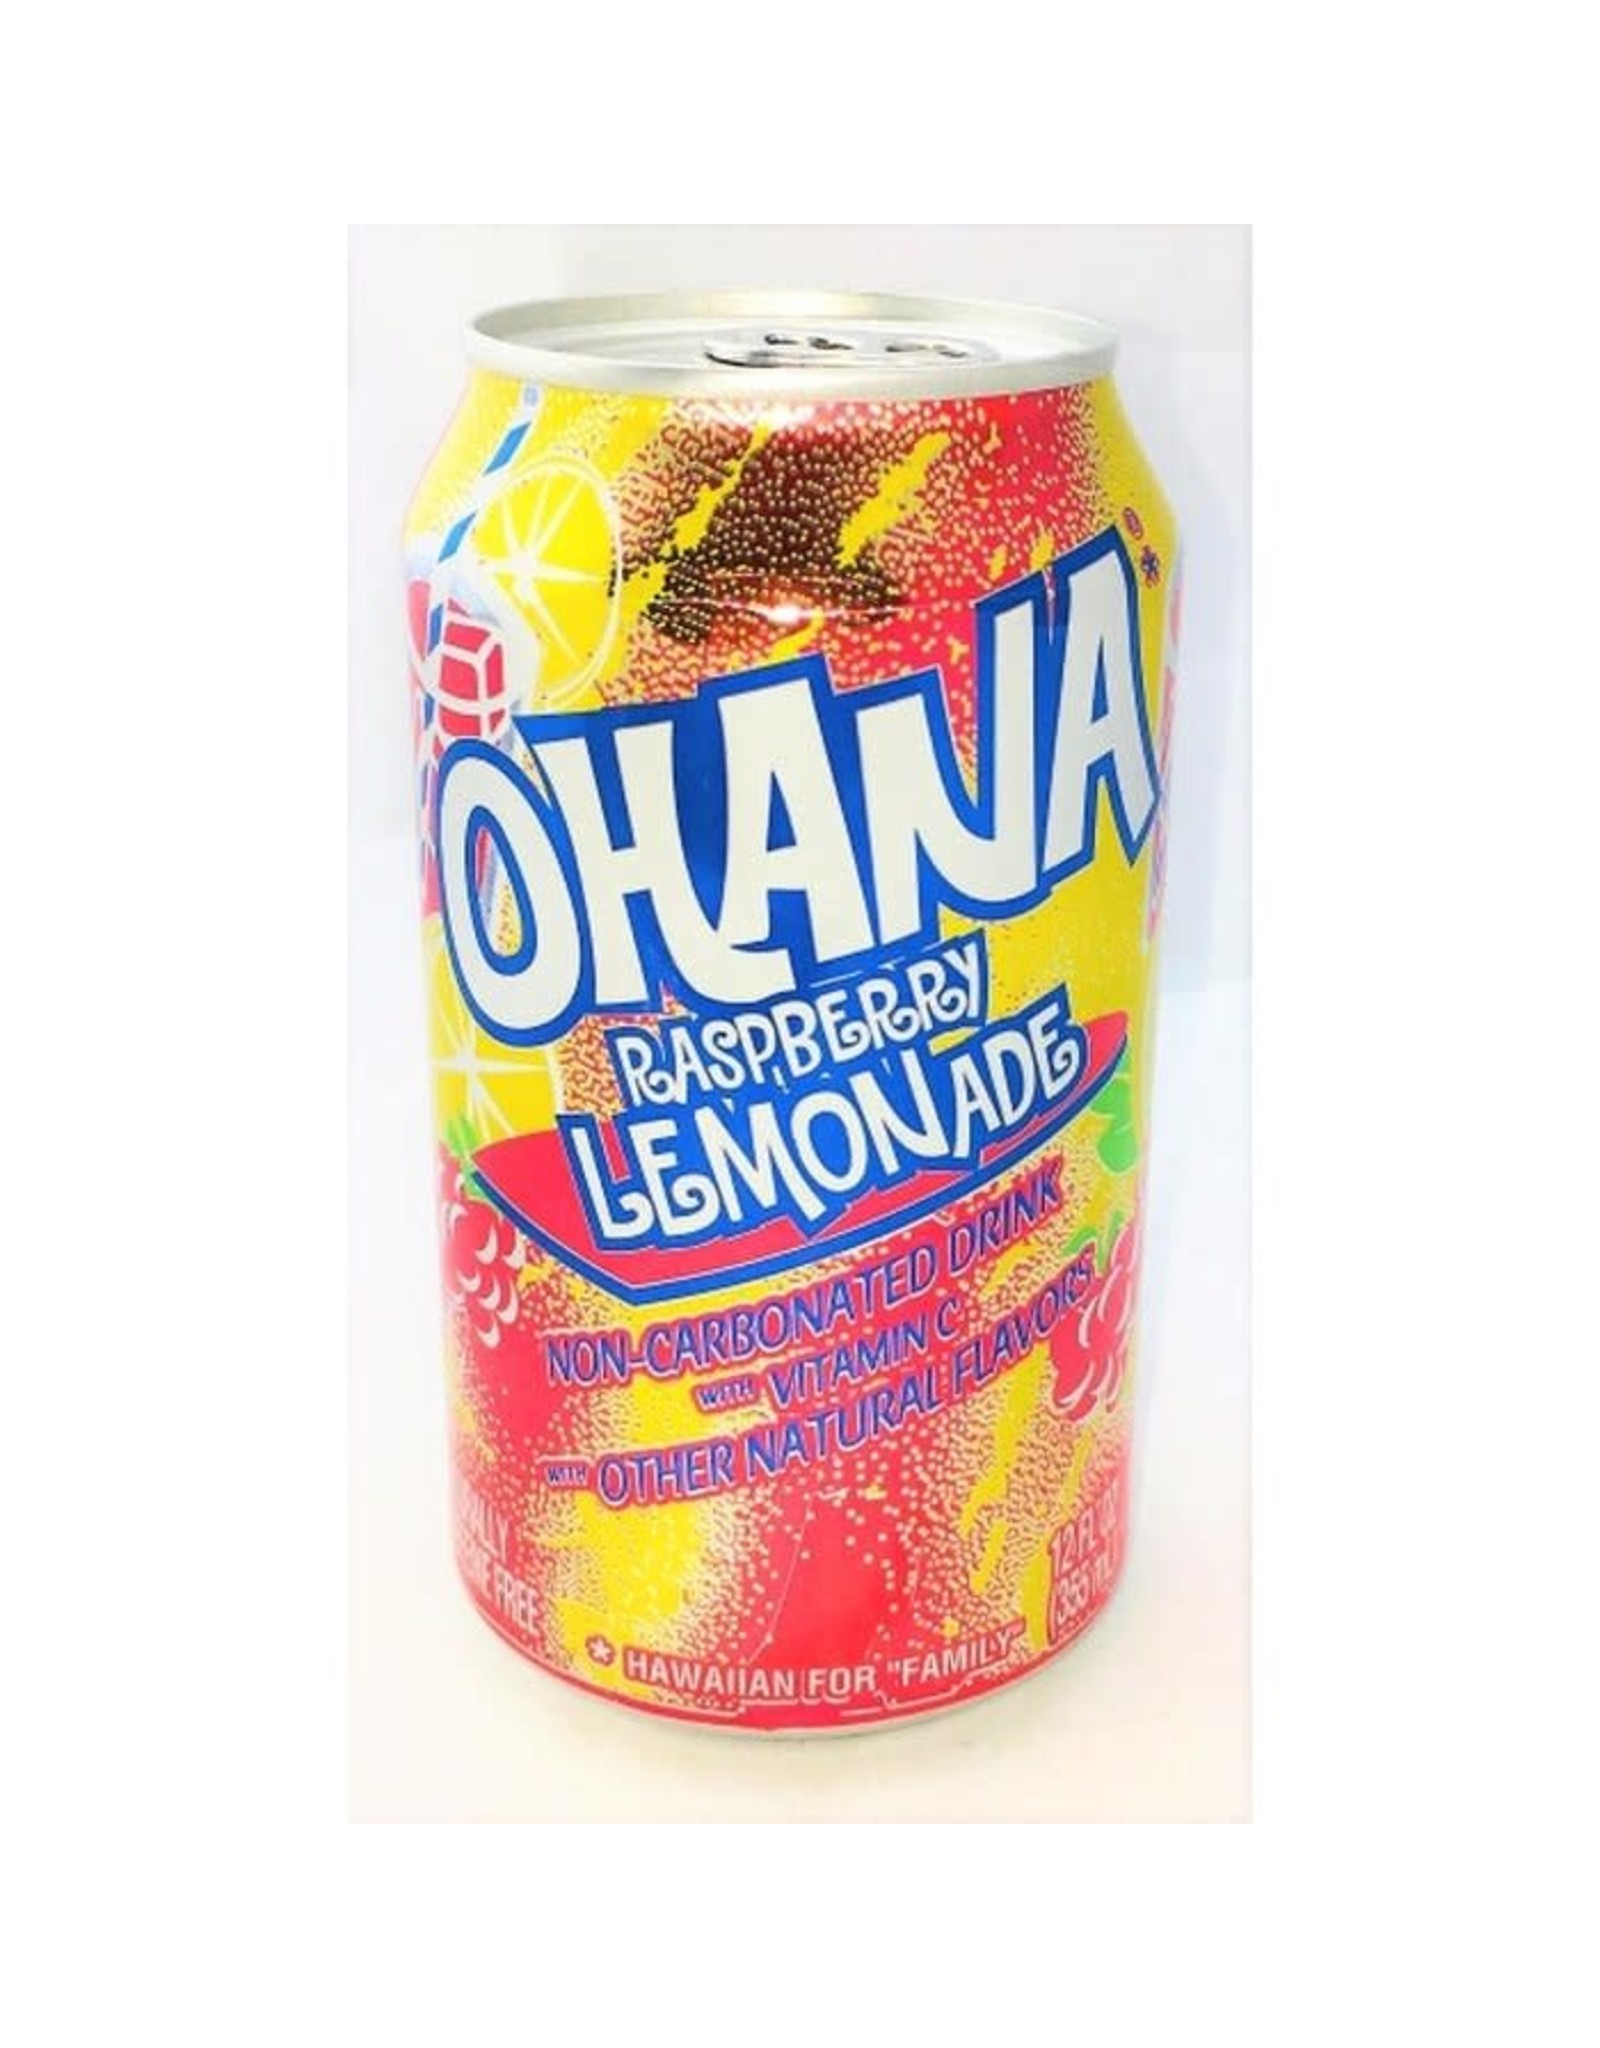 Faygo - Ohana Raspberry Lemonade - 355ml